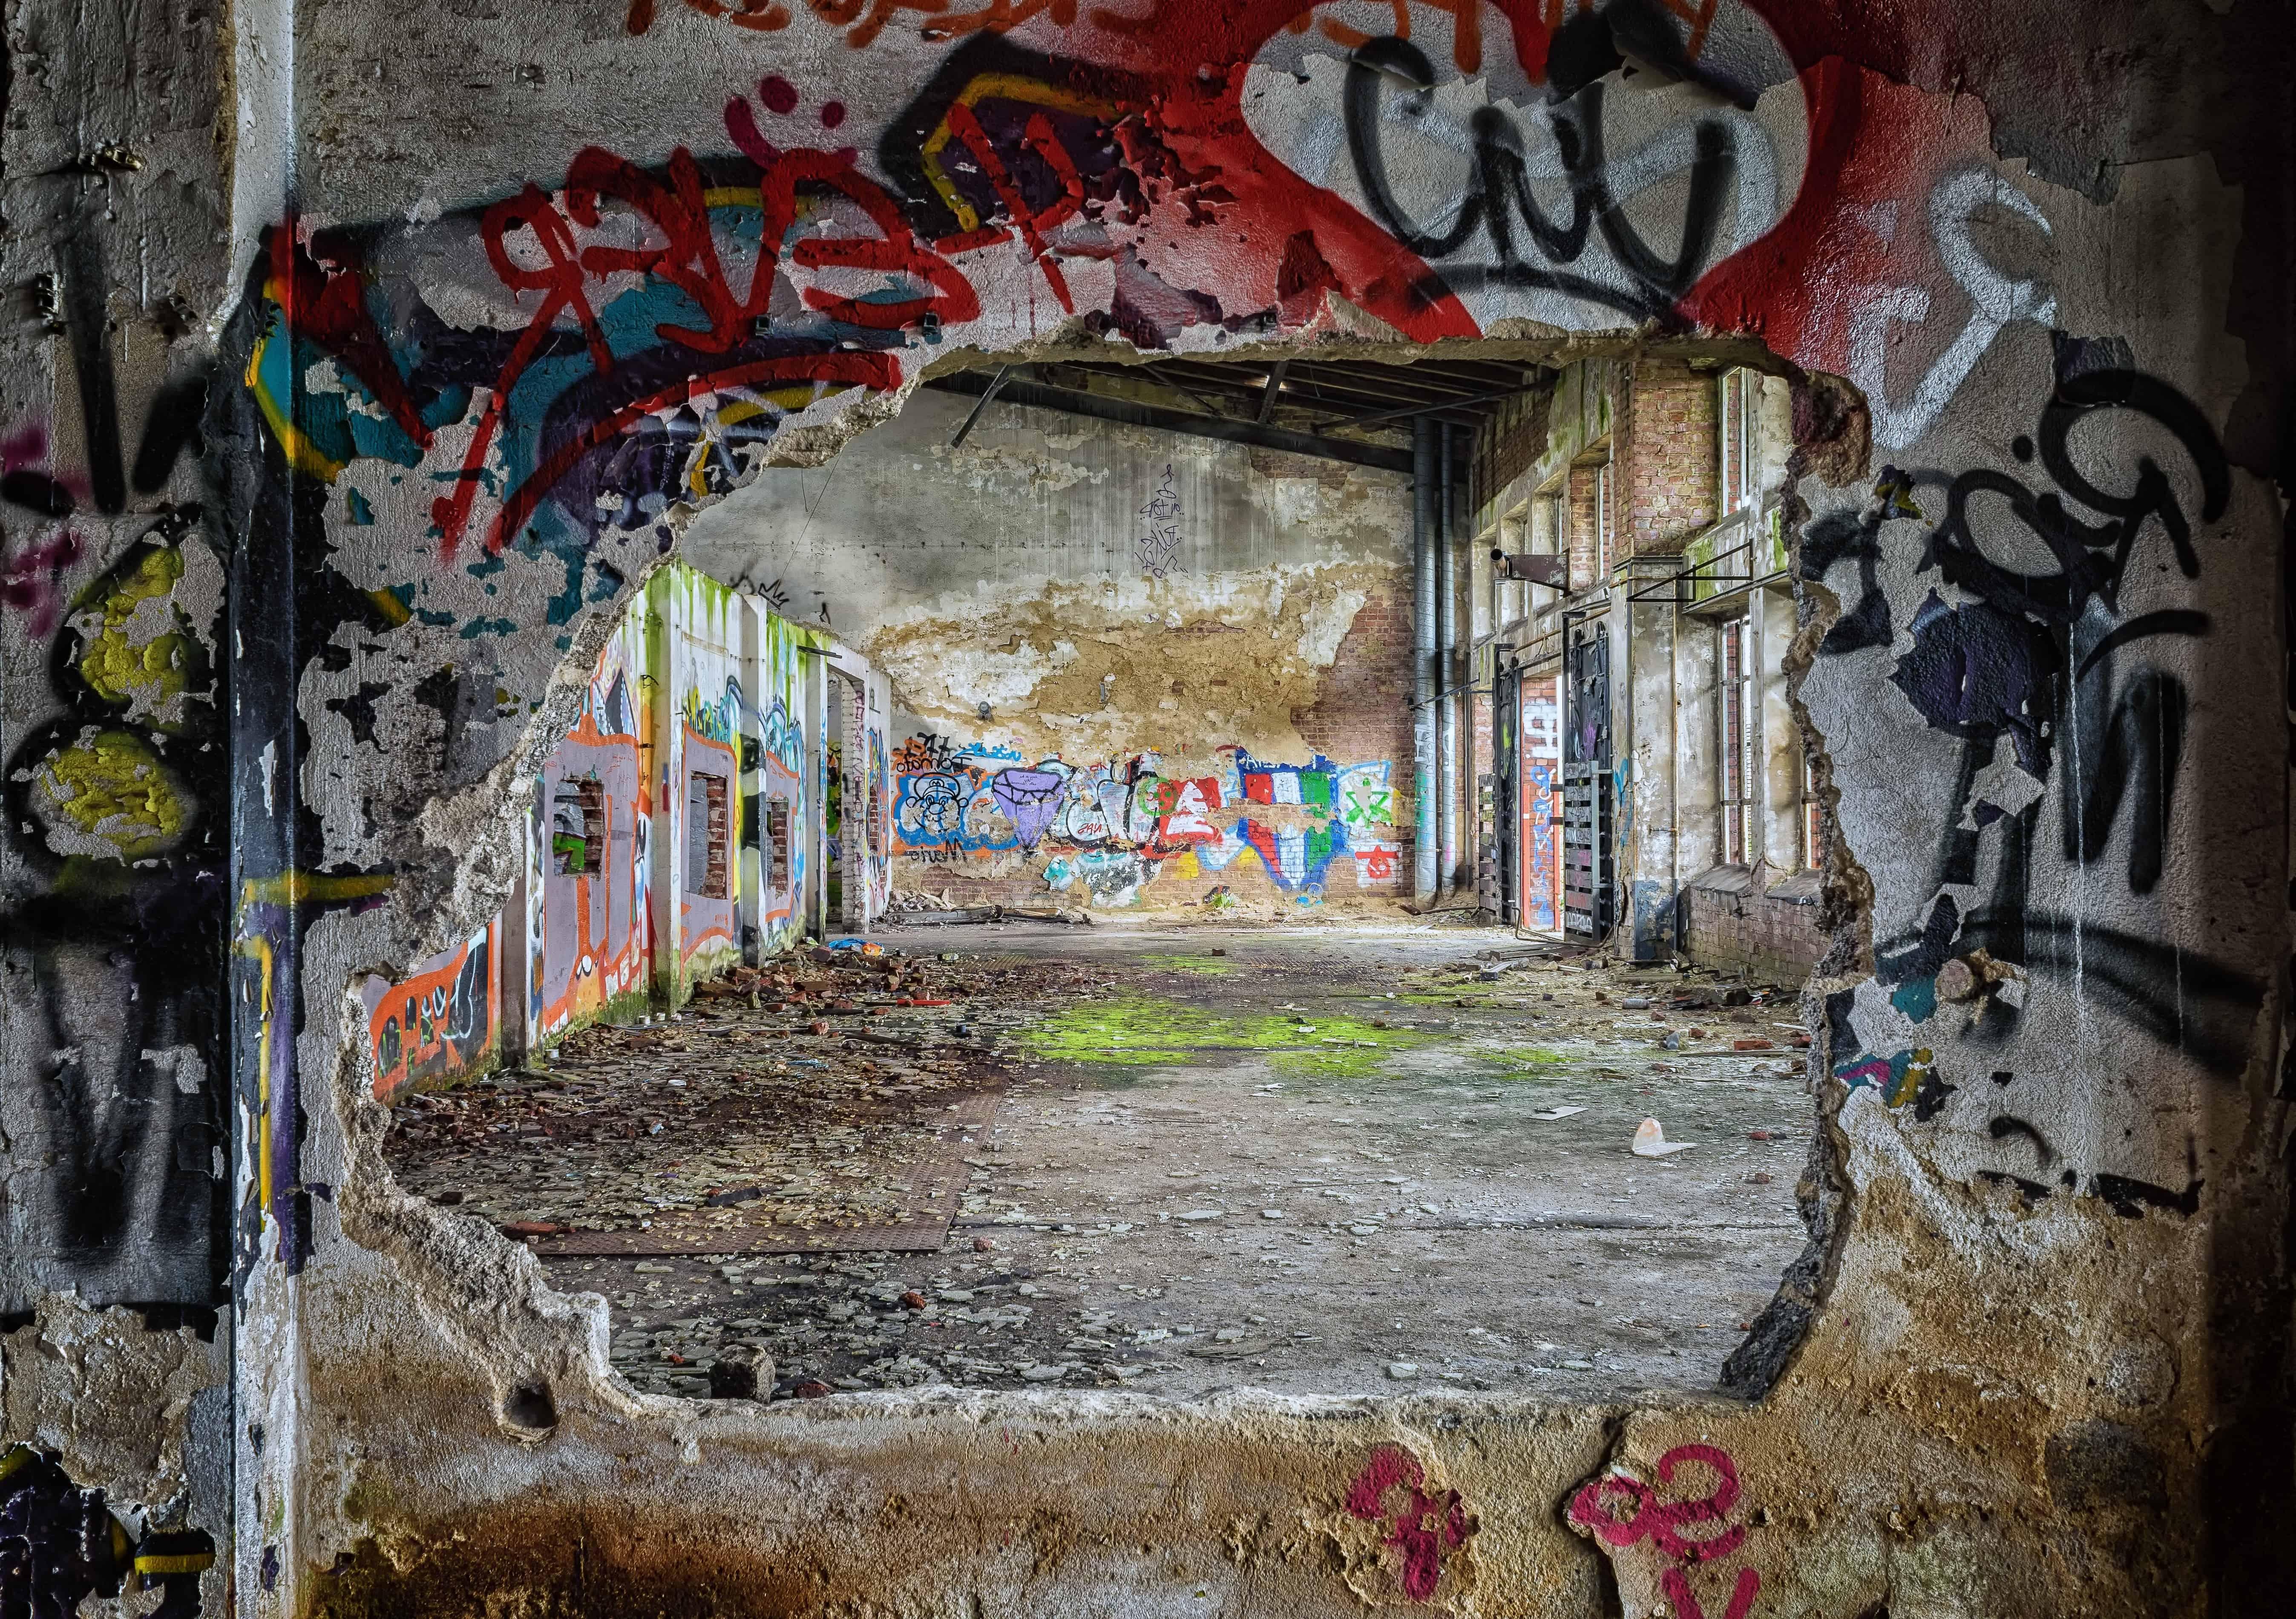 Free picture urban graffiti vandalism wall warehouse